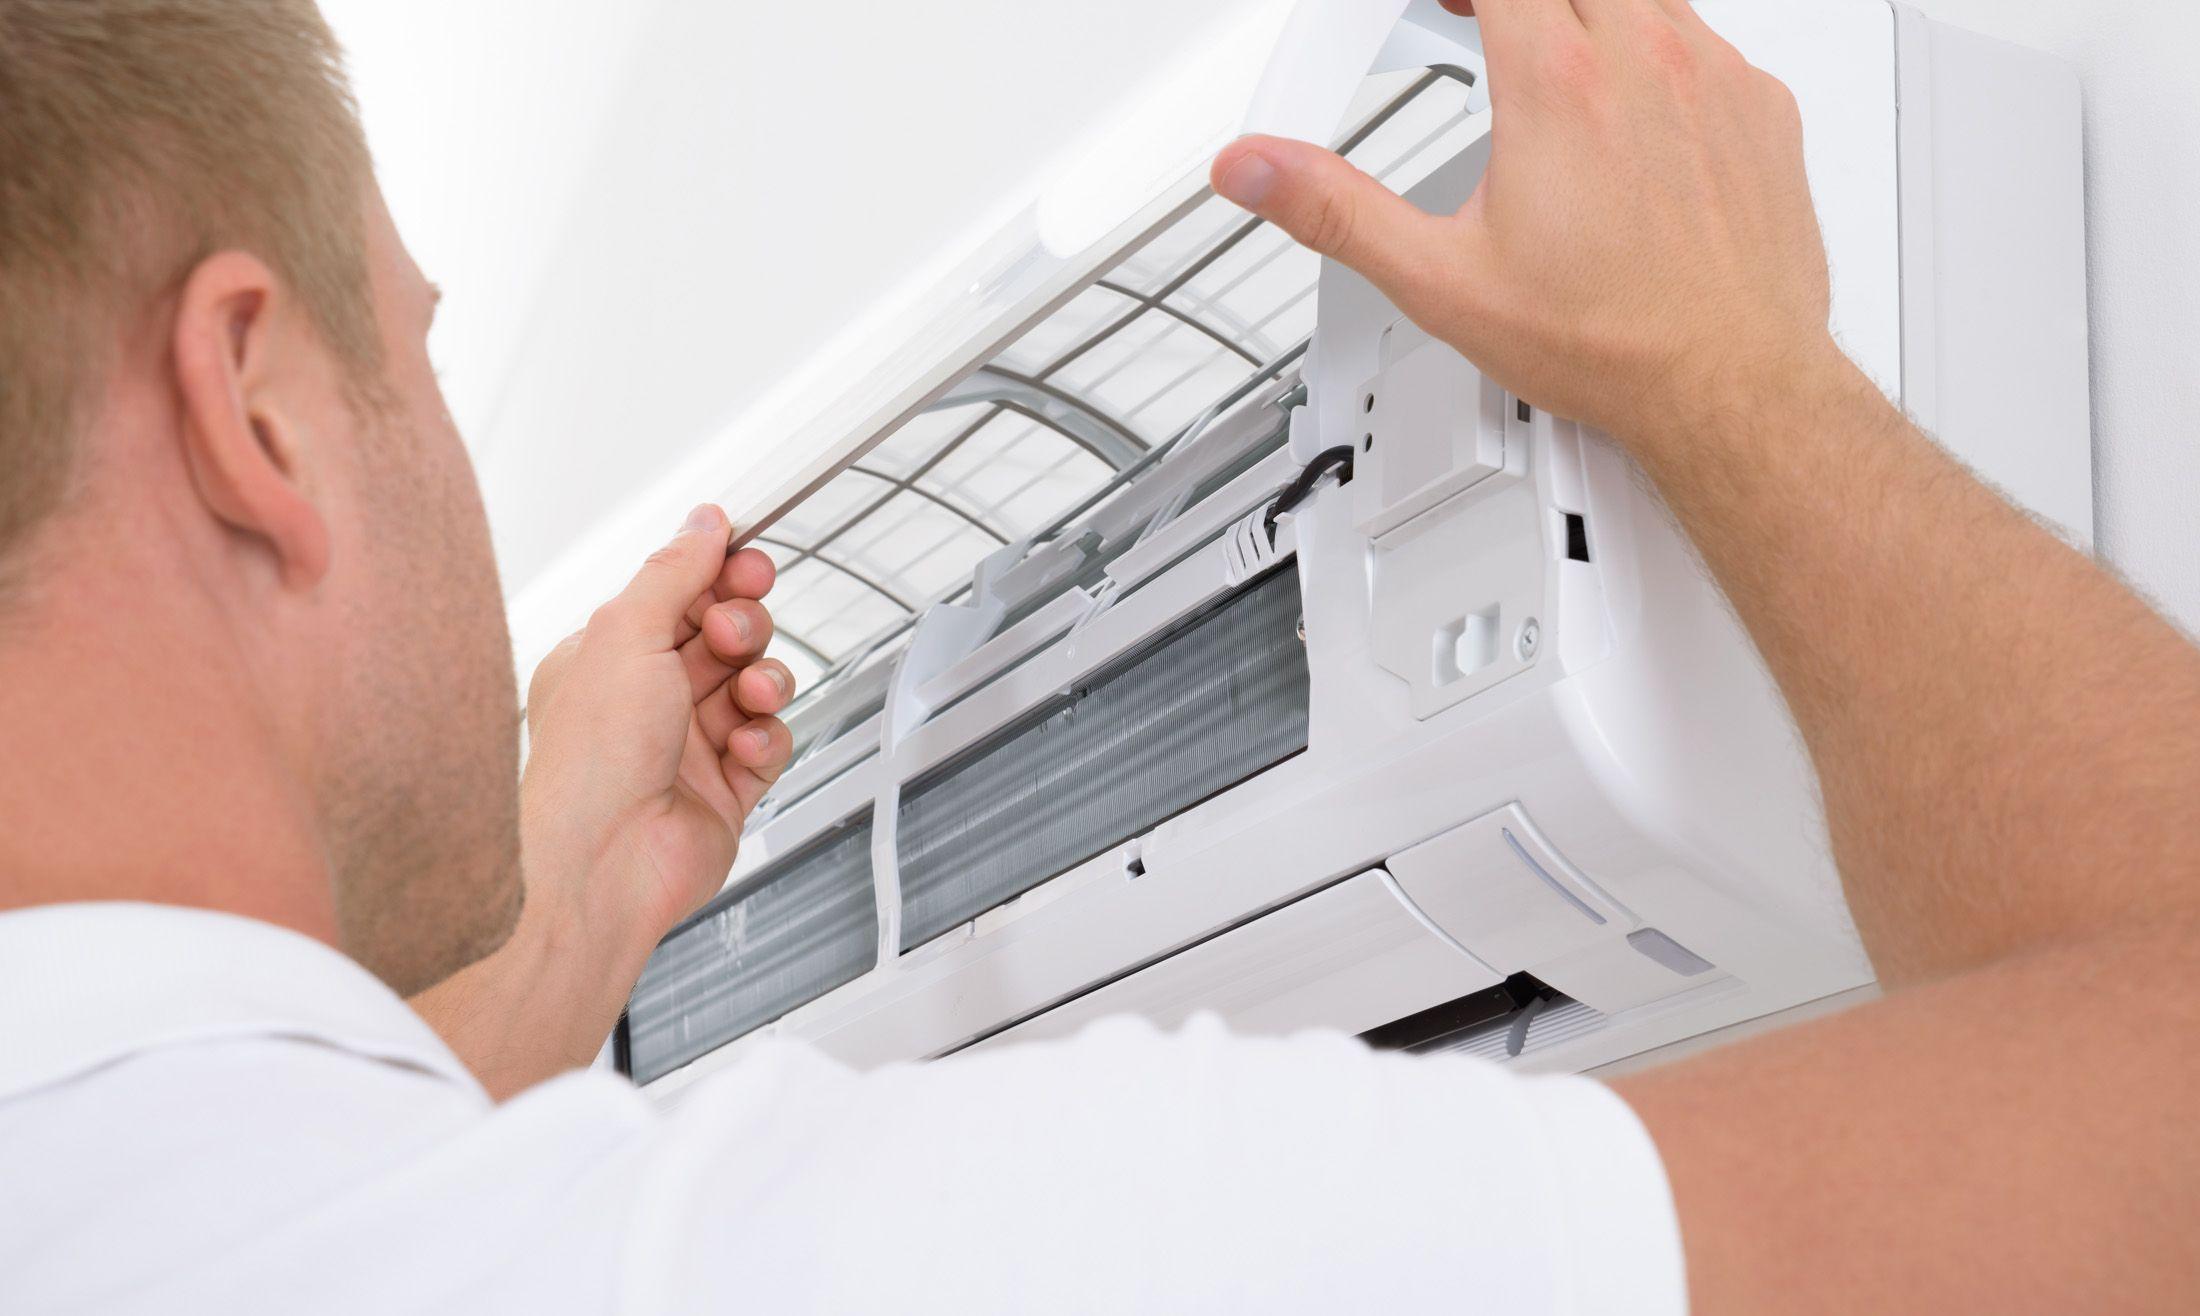 Top Benefits of Hiring Professional AC Repair Services